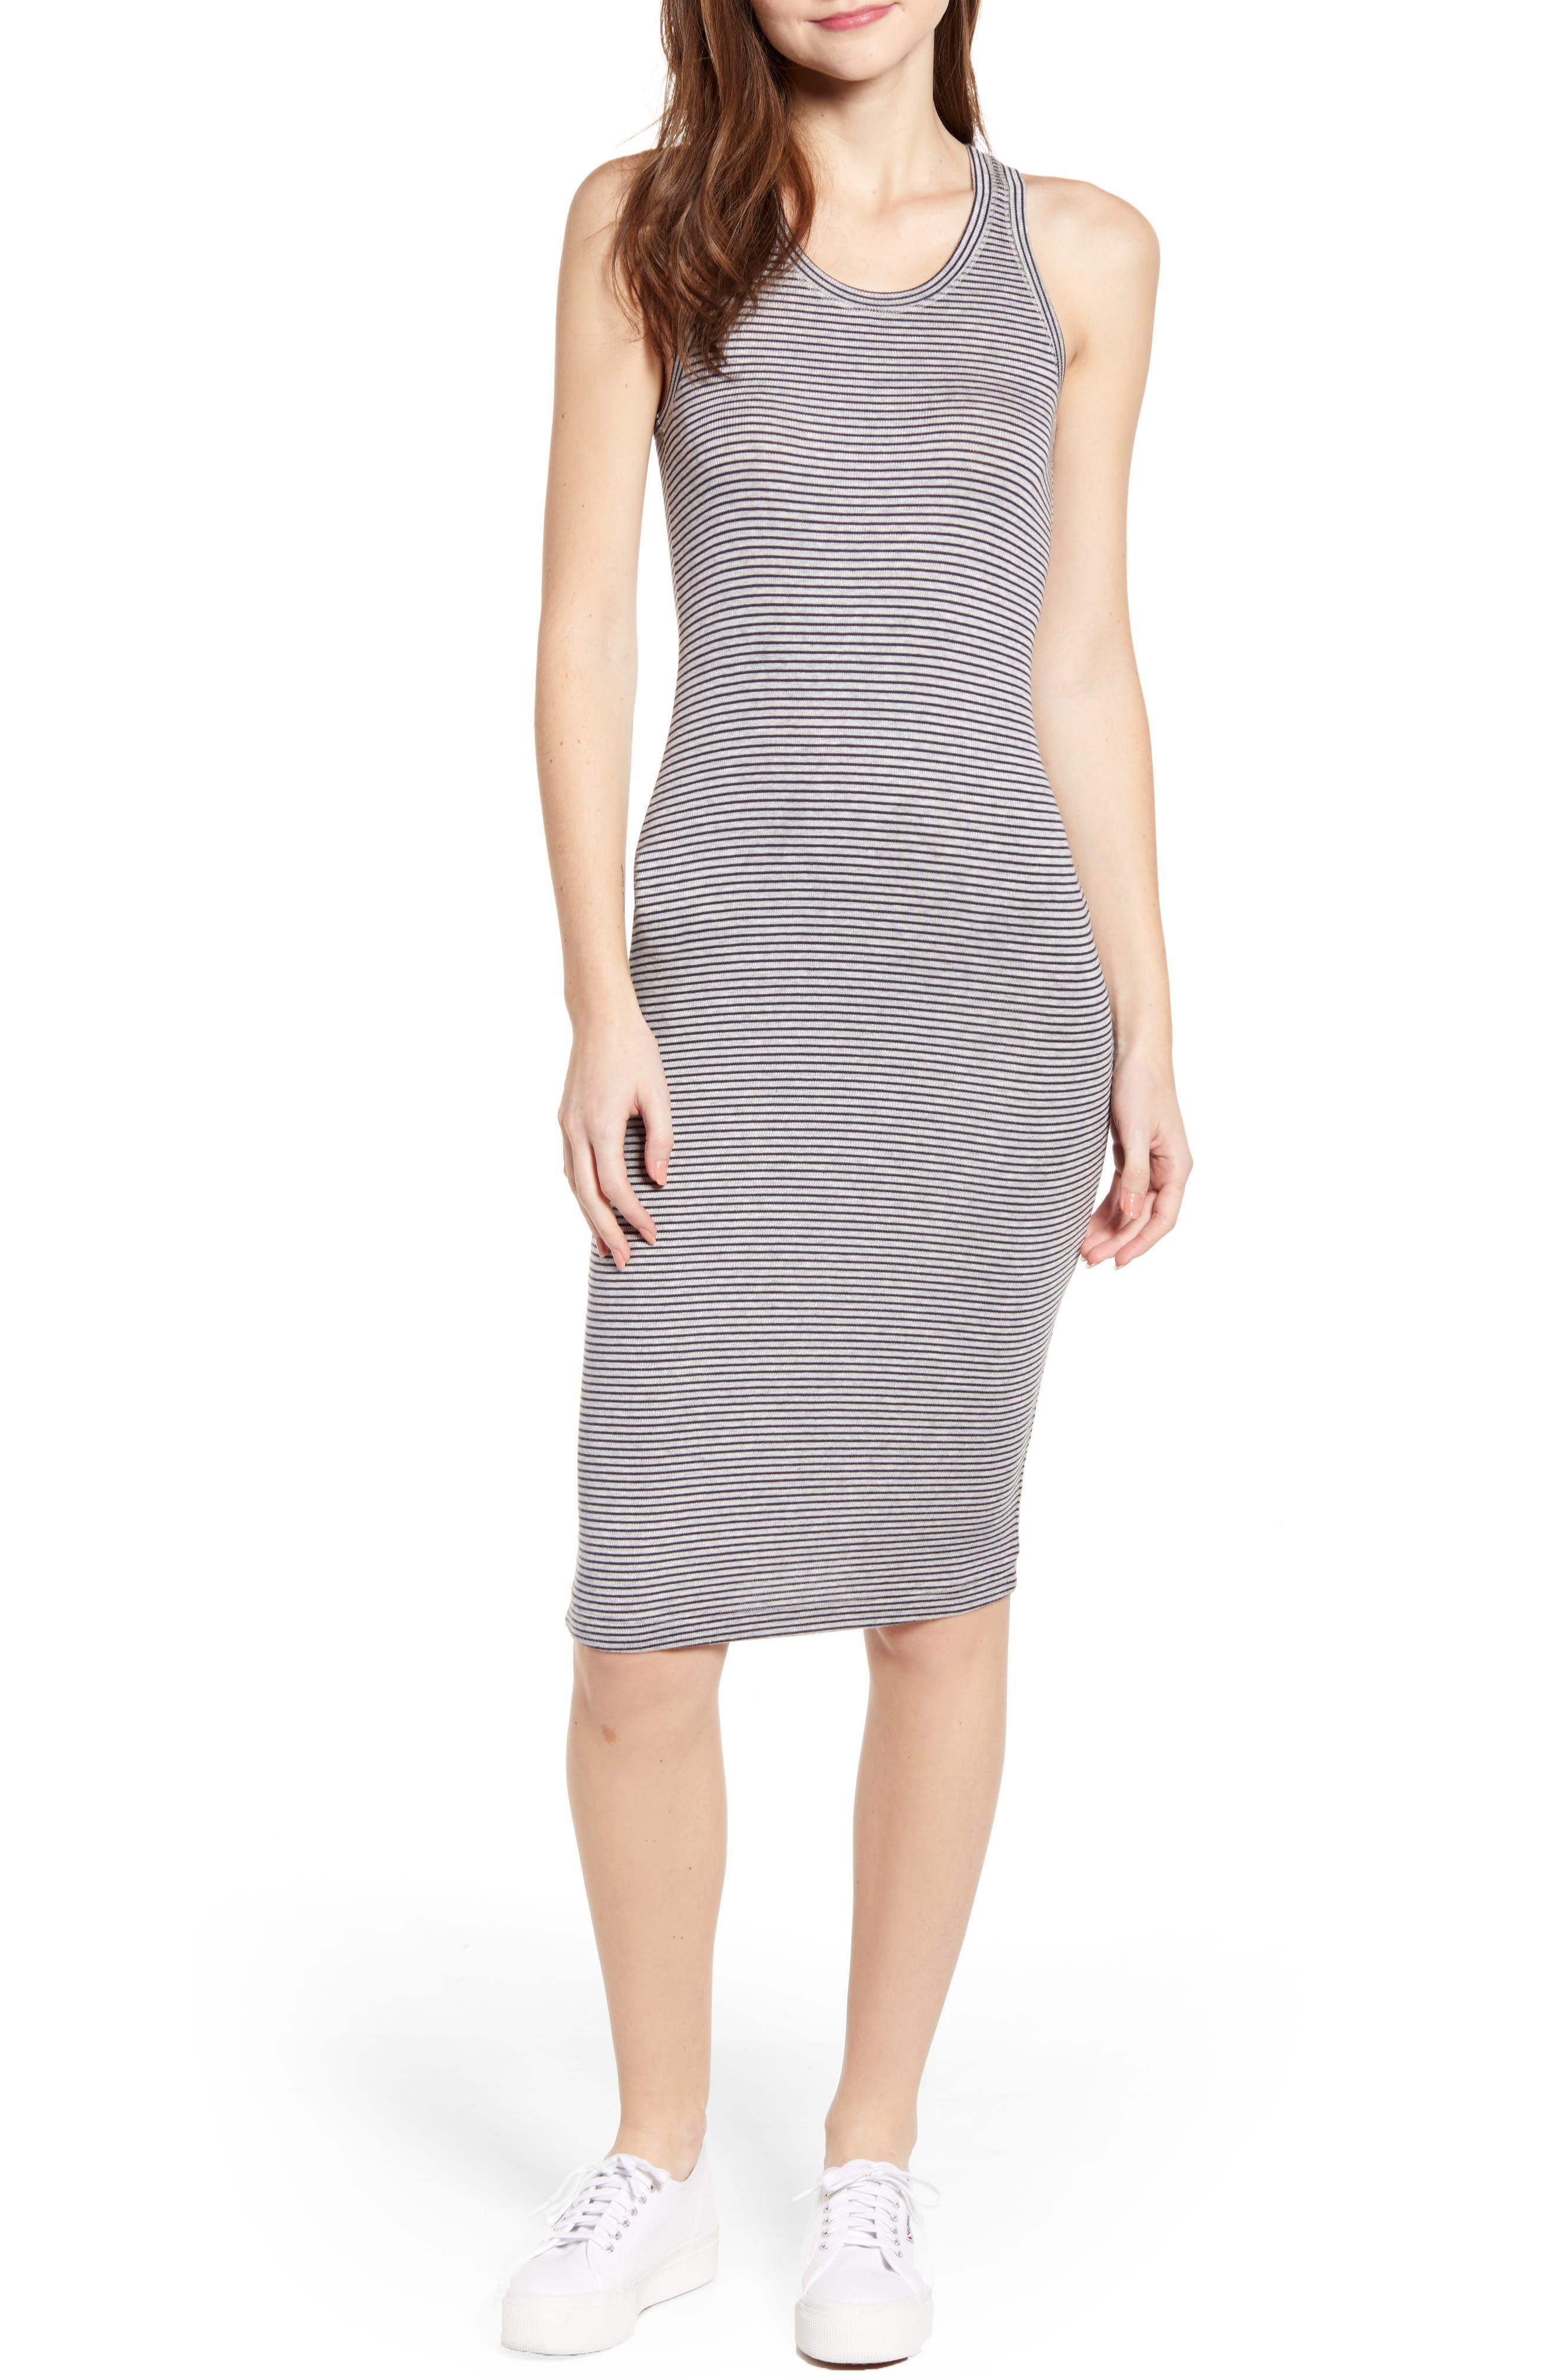 Splendid Stripe Knit Tank Dress, Grey